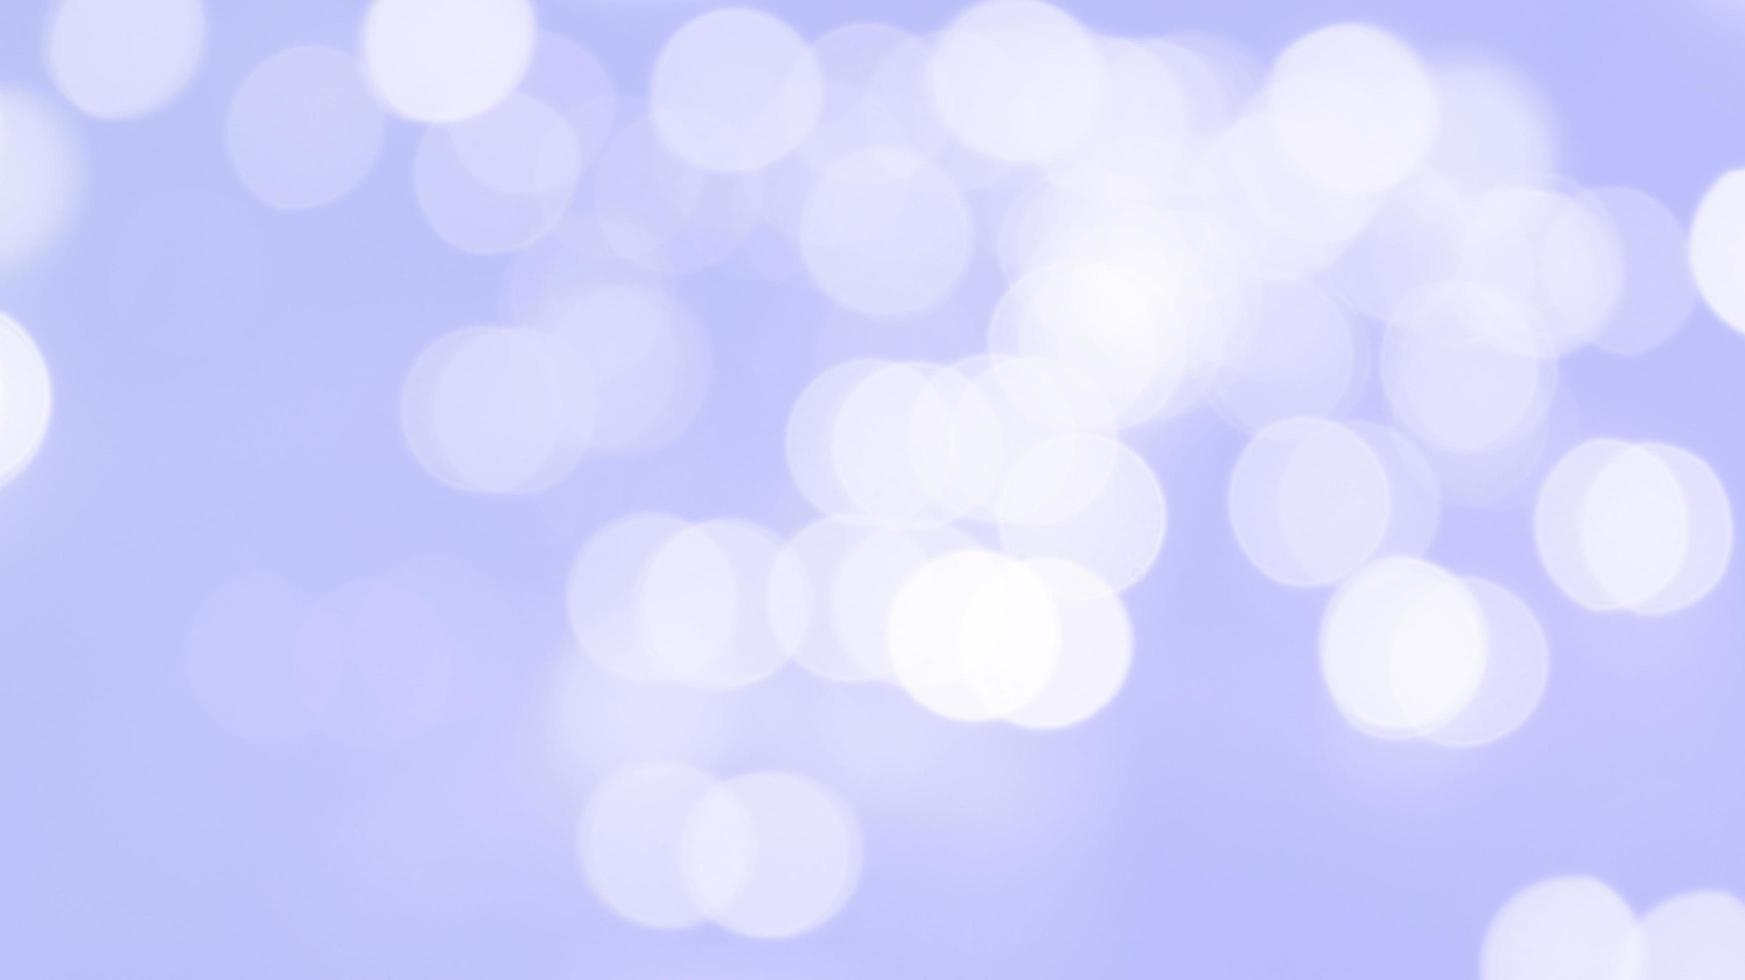 Bokeh lights on purple background photo